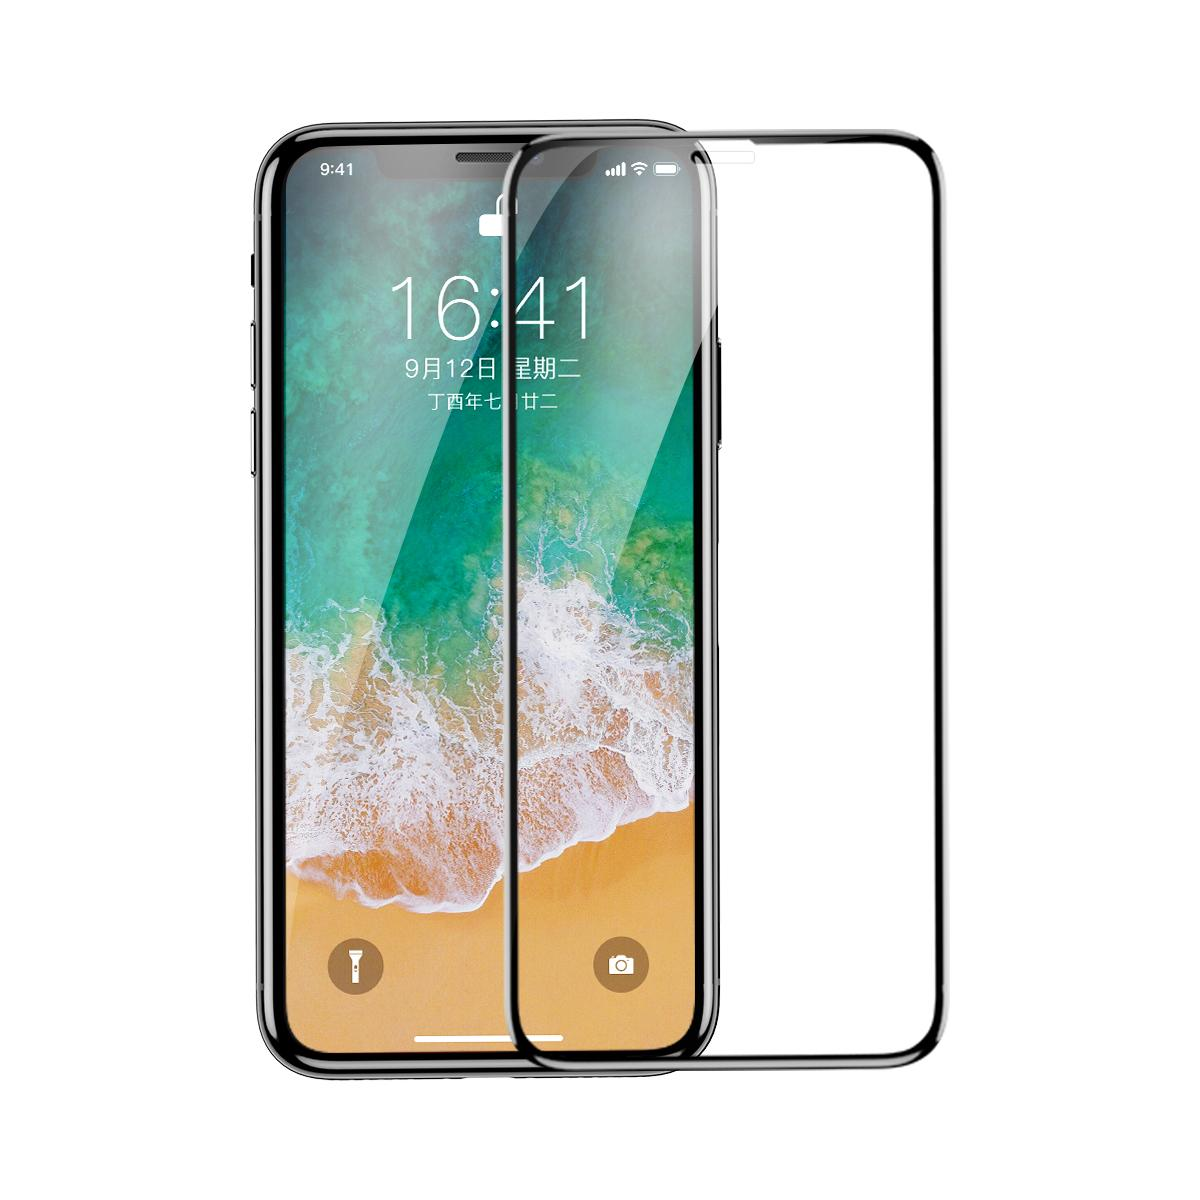 Buy Top Screen Protectors Mobiles Tempered Glass Premium Full Half Curved Glue Uv Nano Liquid Light Samsung S8 Plus S9 Baseus Iphone X Xs Xr Max Soft Pet 023mm